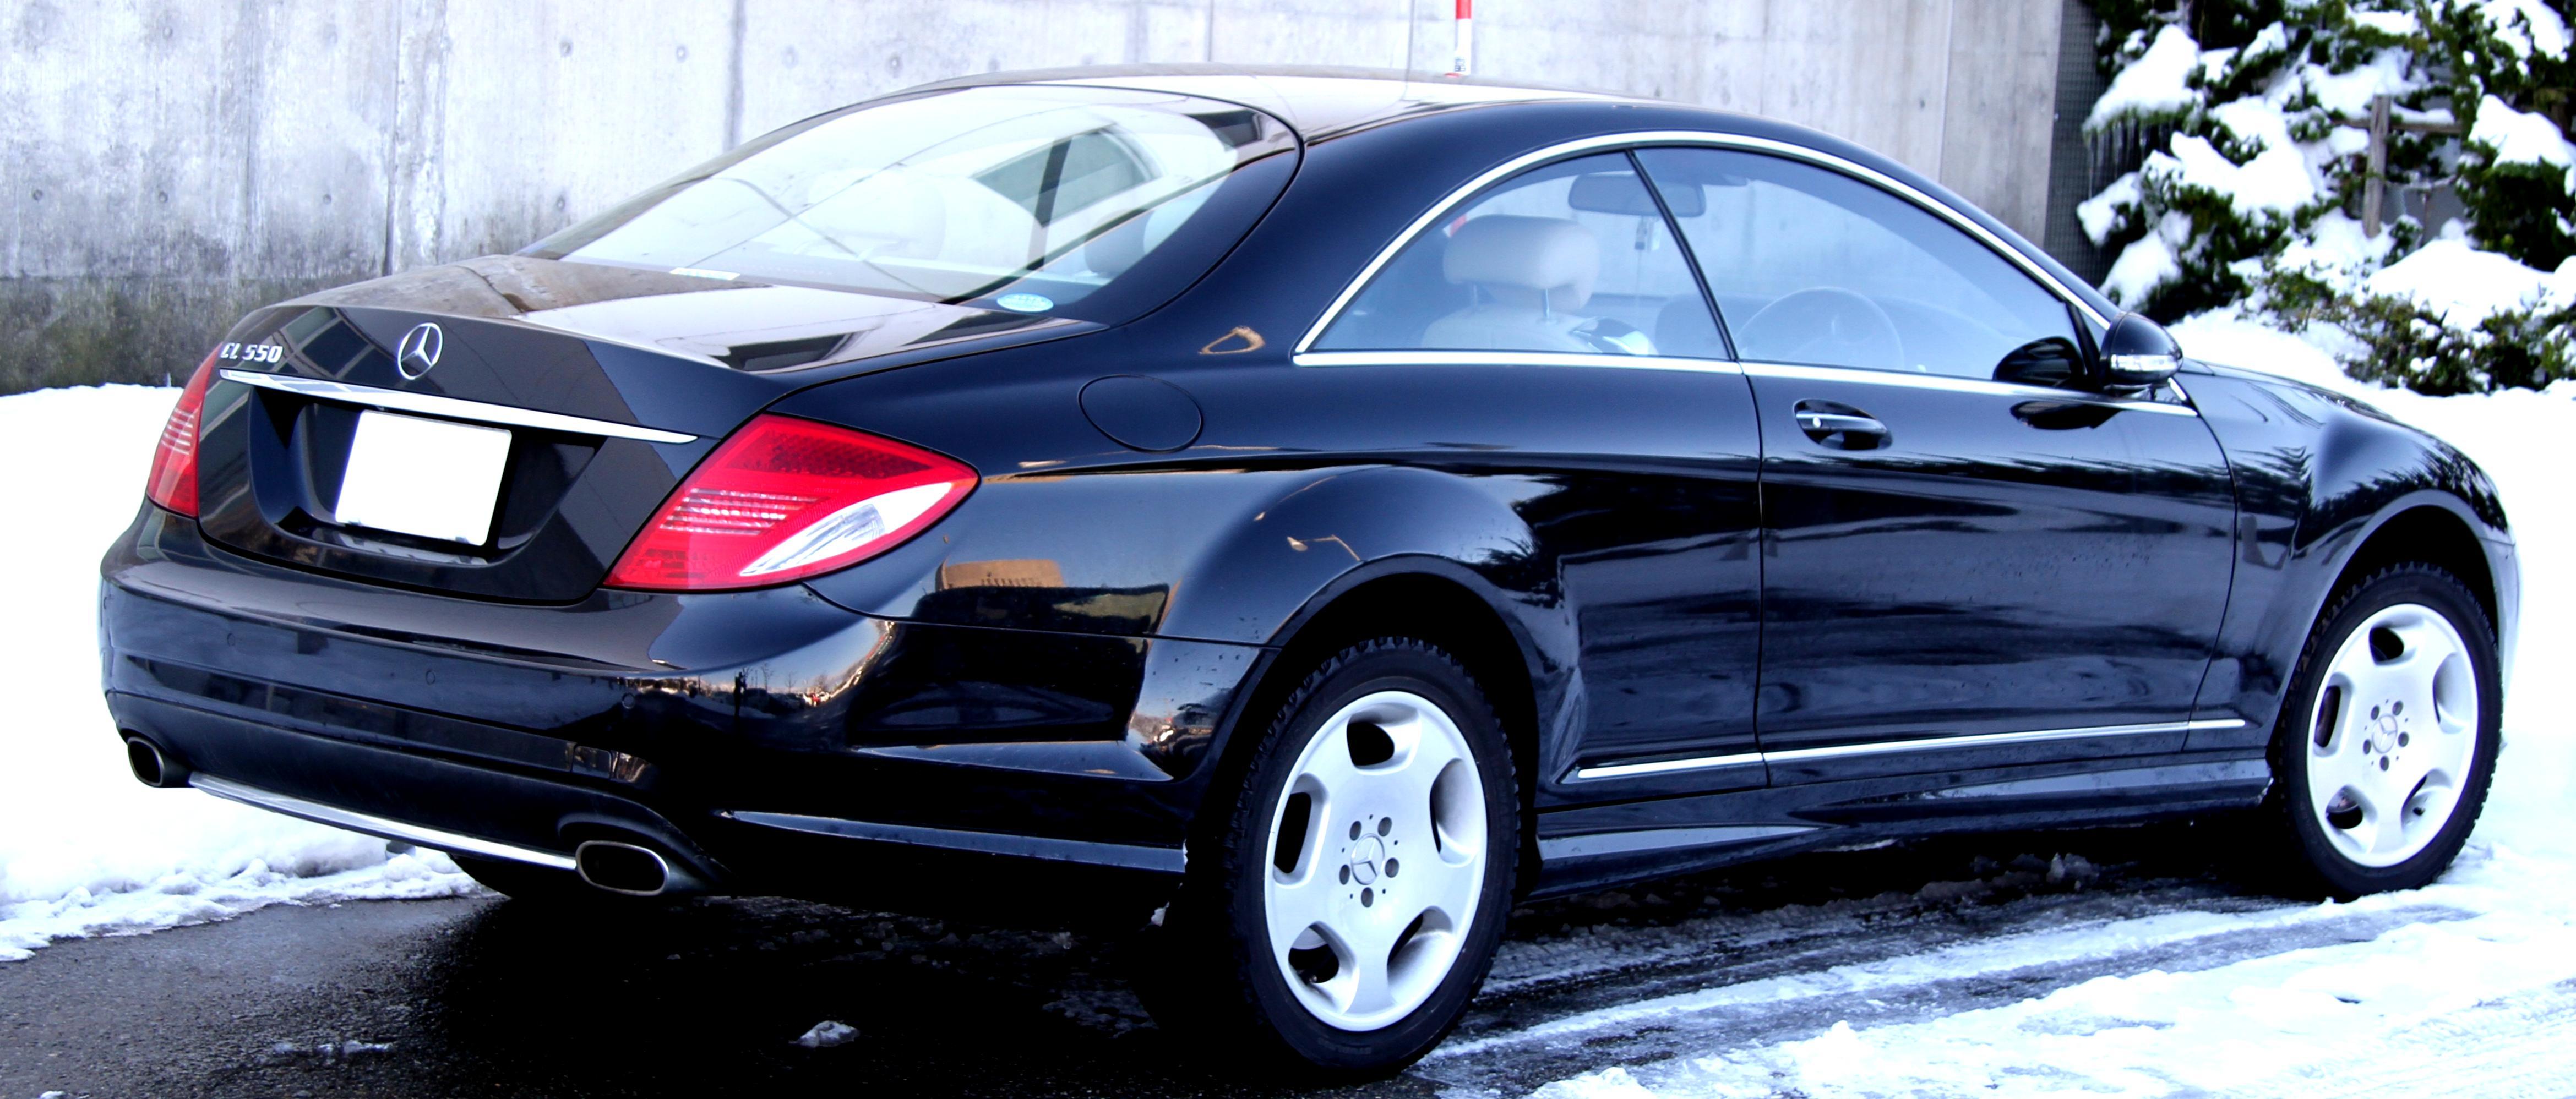 Mercedes benz cl c216 2006 photos 14 on for 2006 mercedes benz cl500